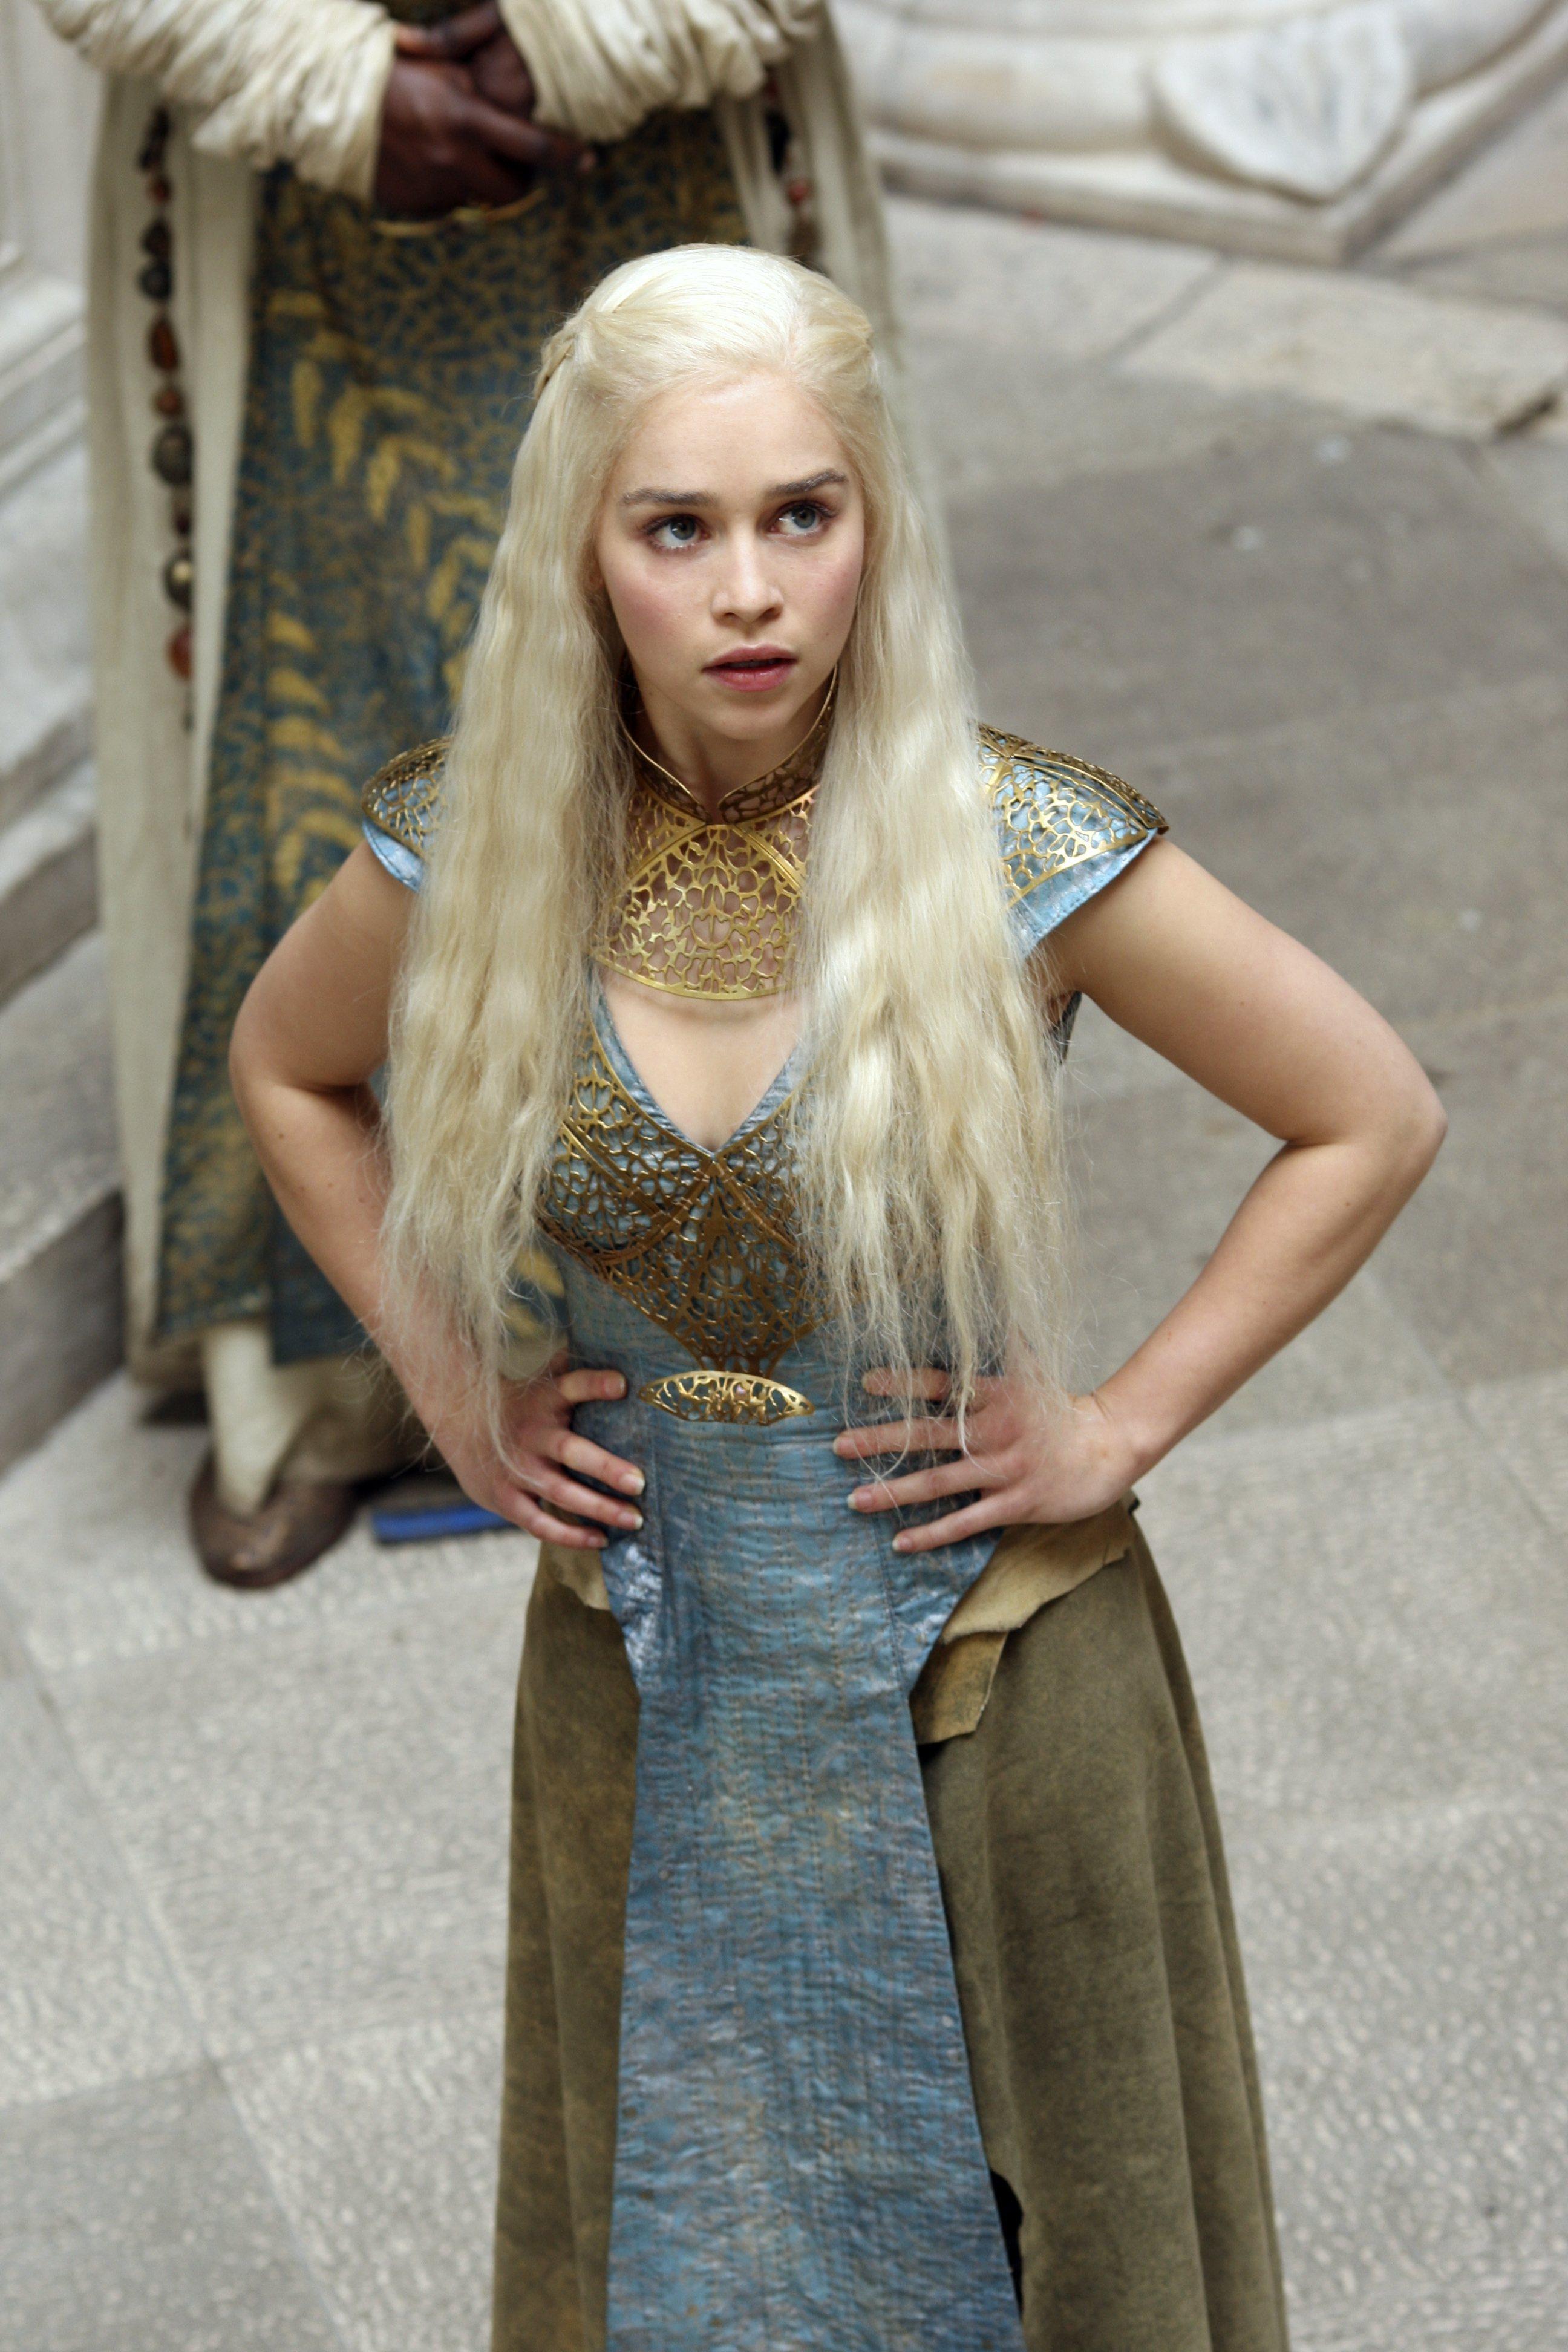 Daenerys targaryen and khal drogo wallpaper daenerys targaryen wedding - Daenerys Targaryen Daenerys Daenerys Targaryen Game Of Thrones Daenerystargaryen Whitewalkersgot Whitewalkersnet Daenerys Targaryen Pinterest